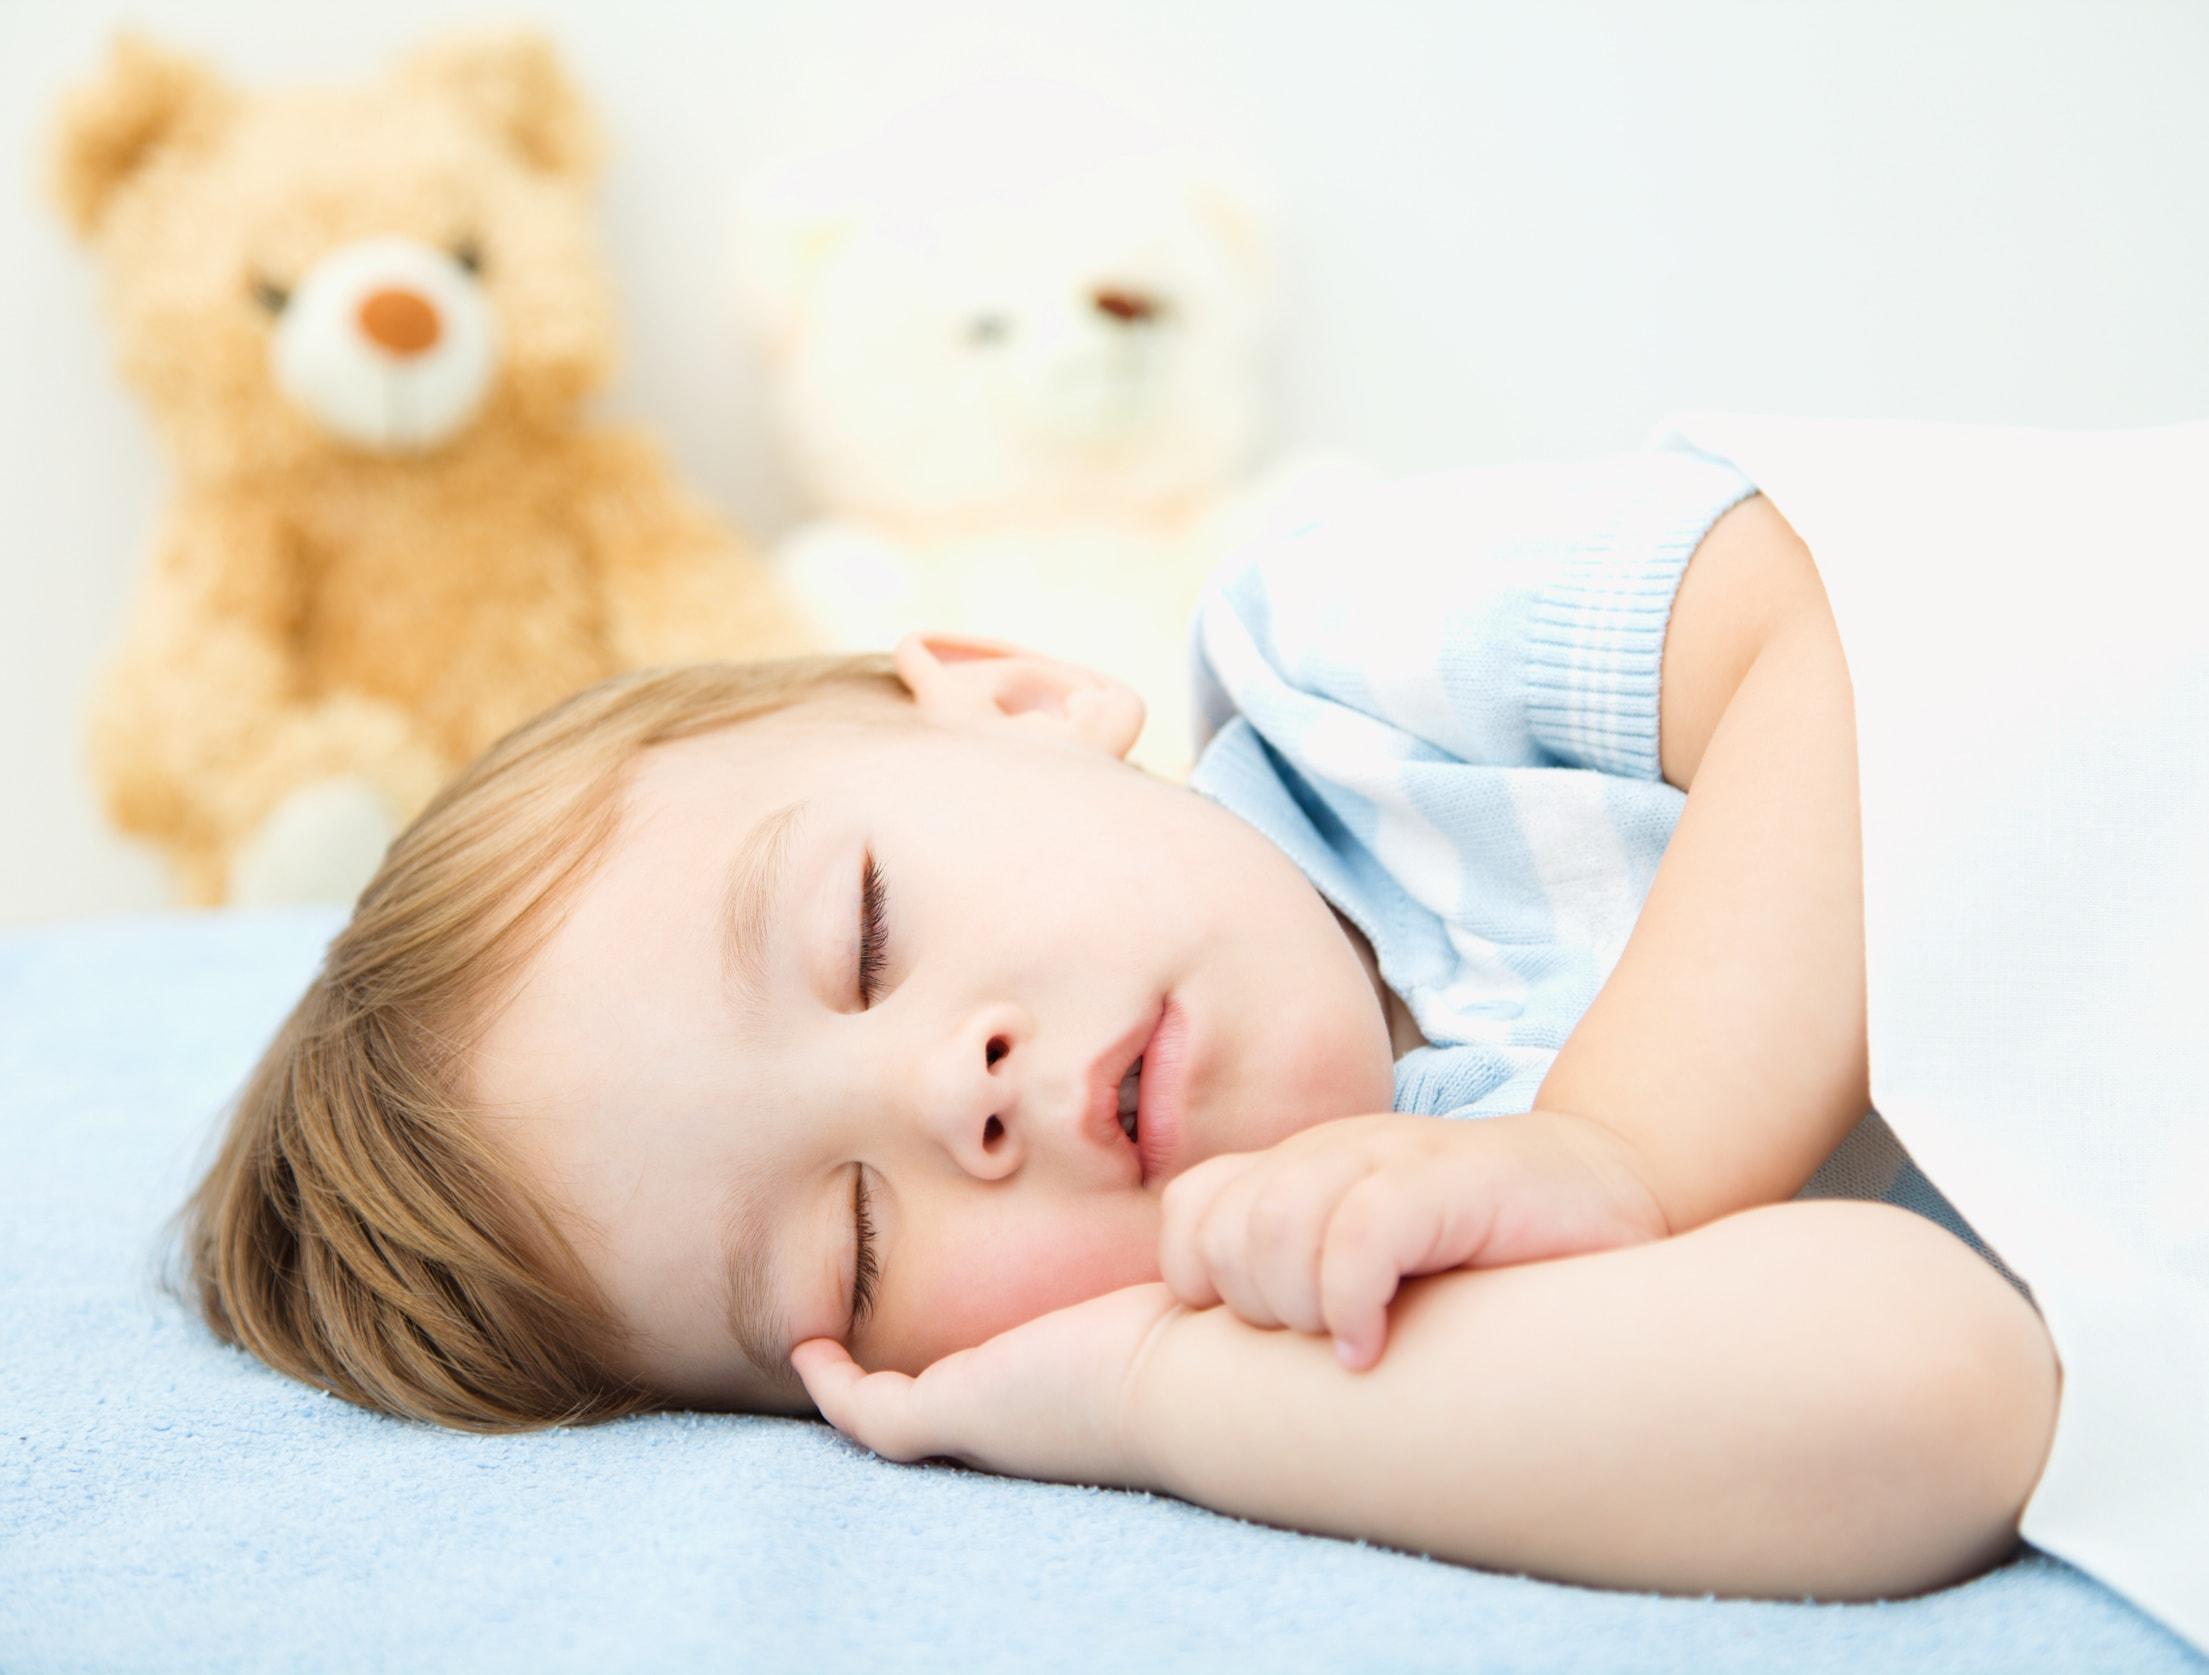 cuando empezar a usar almohada infantil